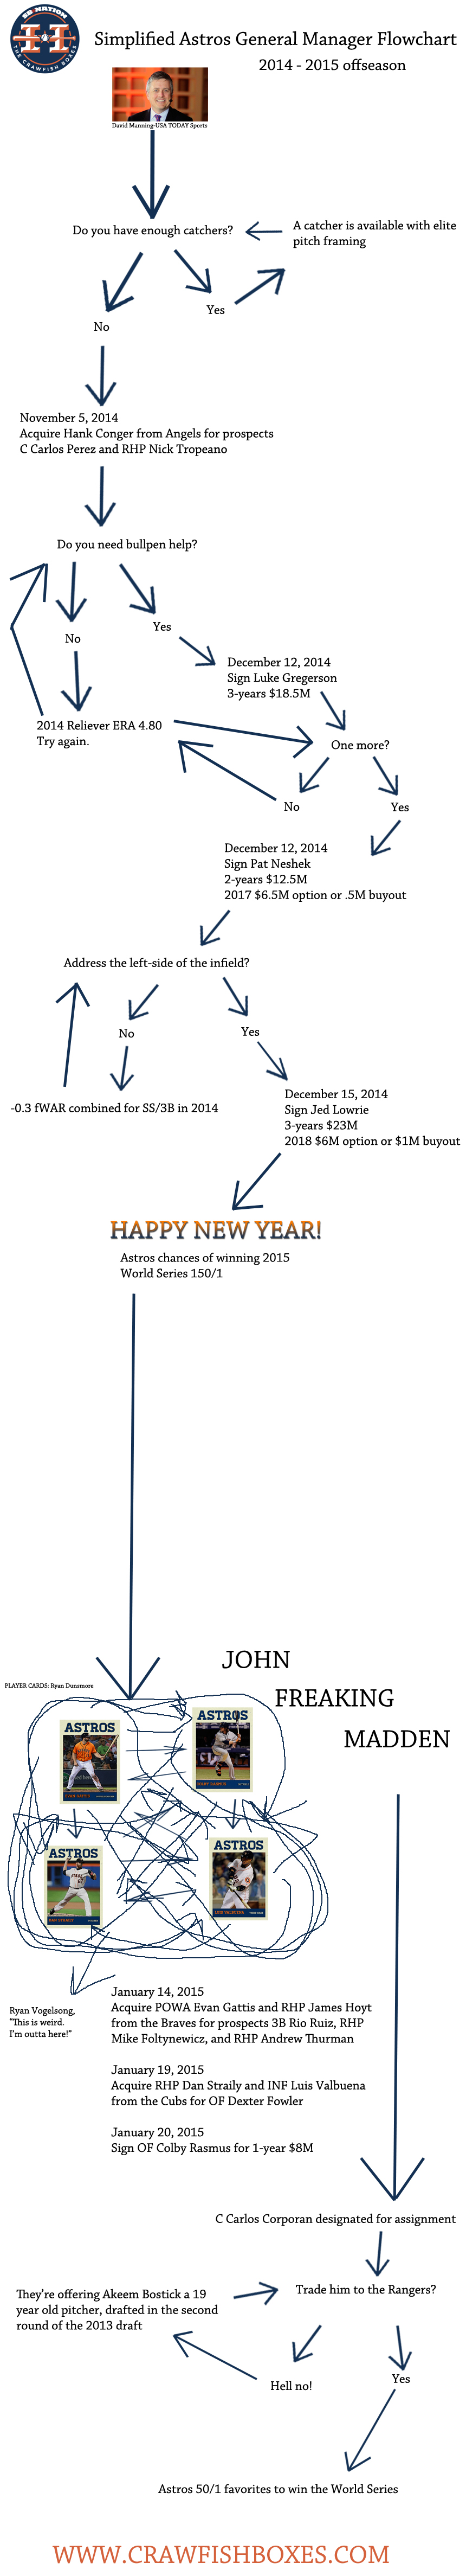 Astros 2014 2015 offseason transaction infographic flowchart the astros 2014 2015 offseason transaction infographic flowchart the crawfish boxes nvjuhfo Choice Image